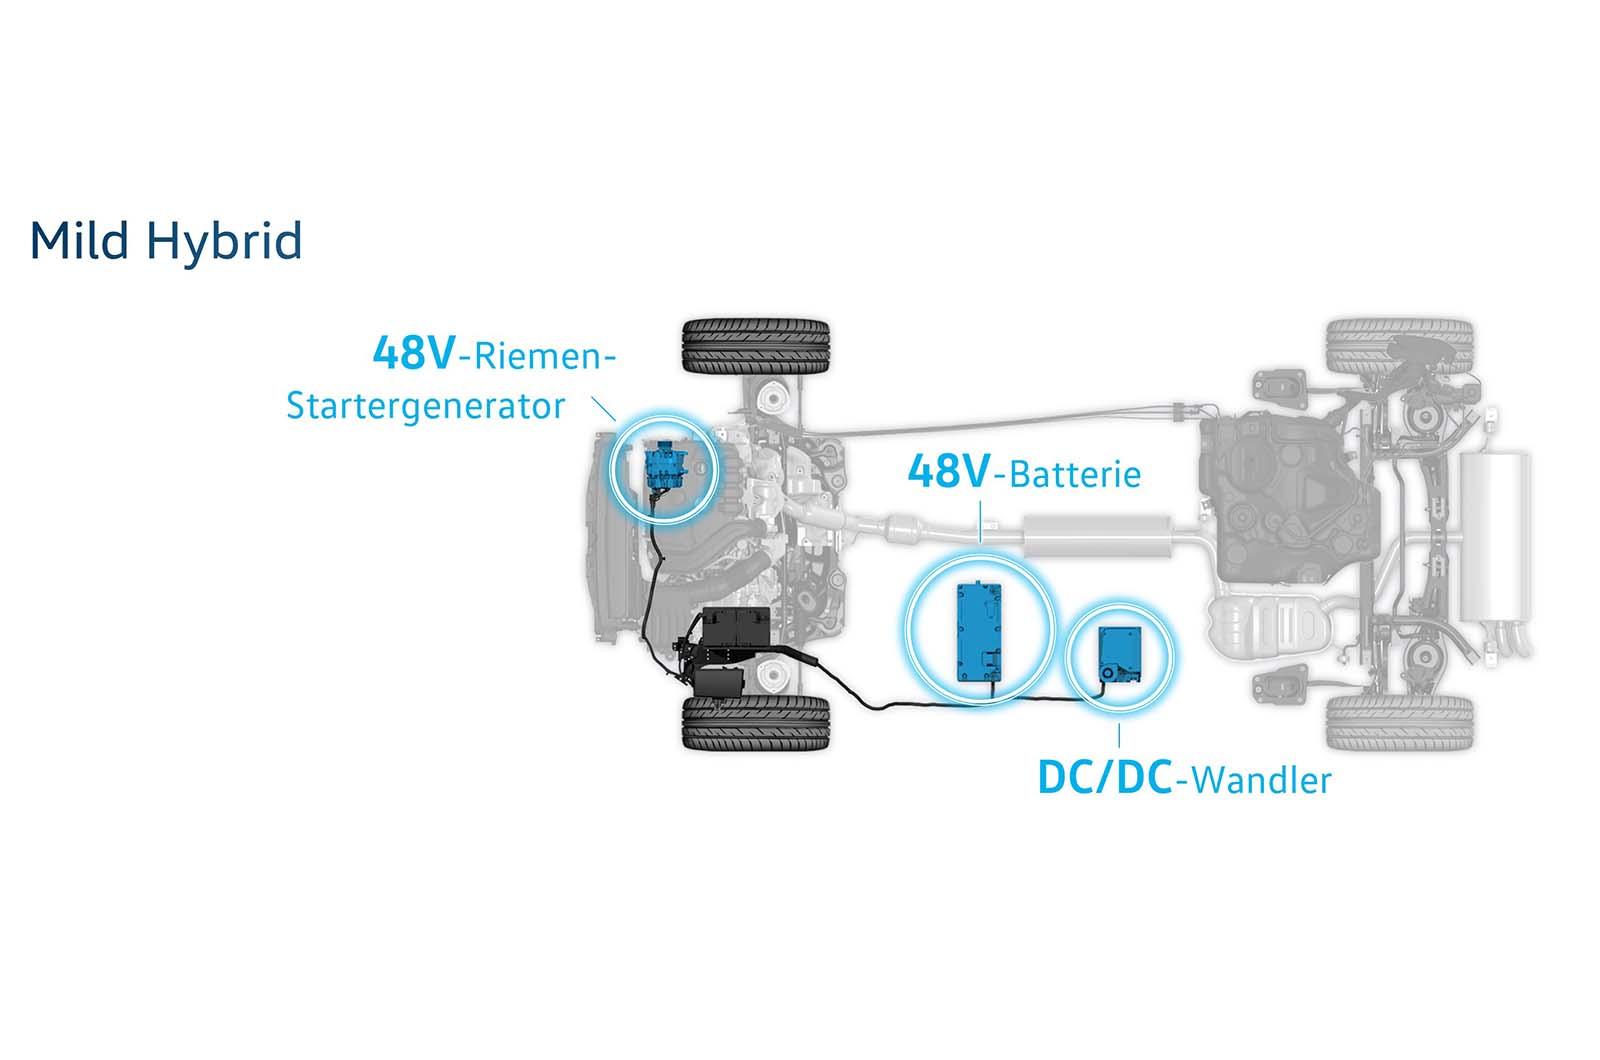 Volkswagen Announces Plans For Mild Hybrid Trains